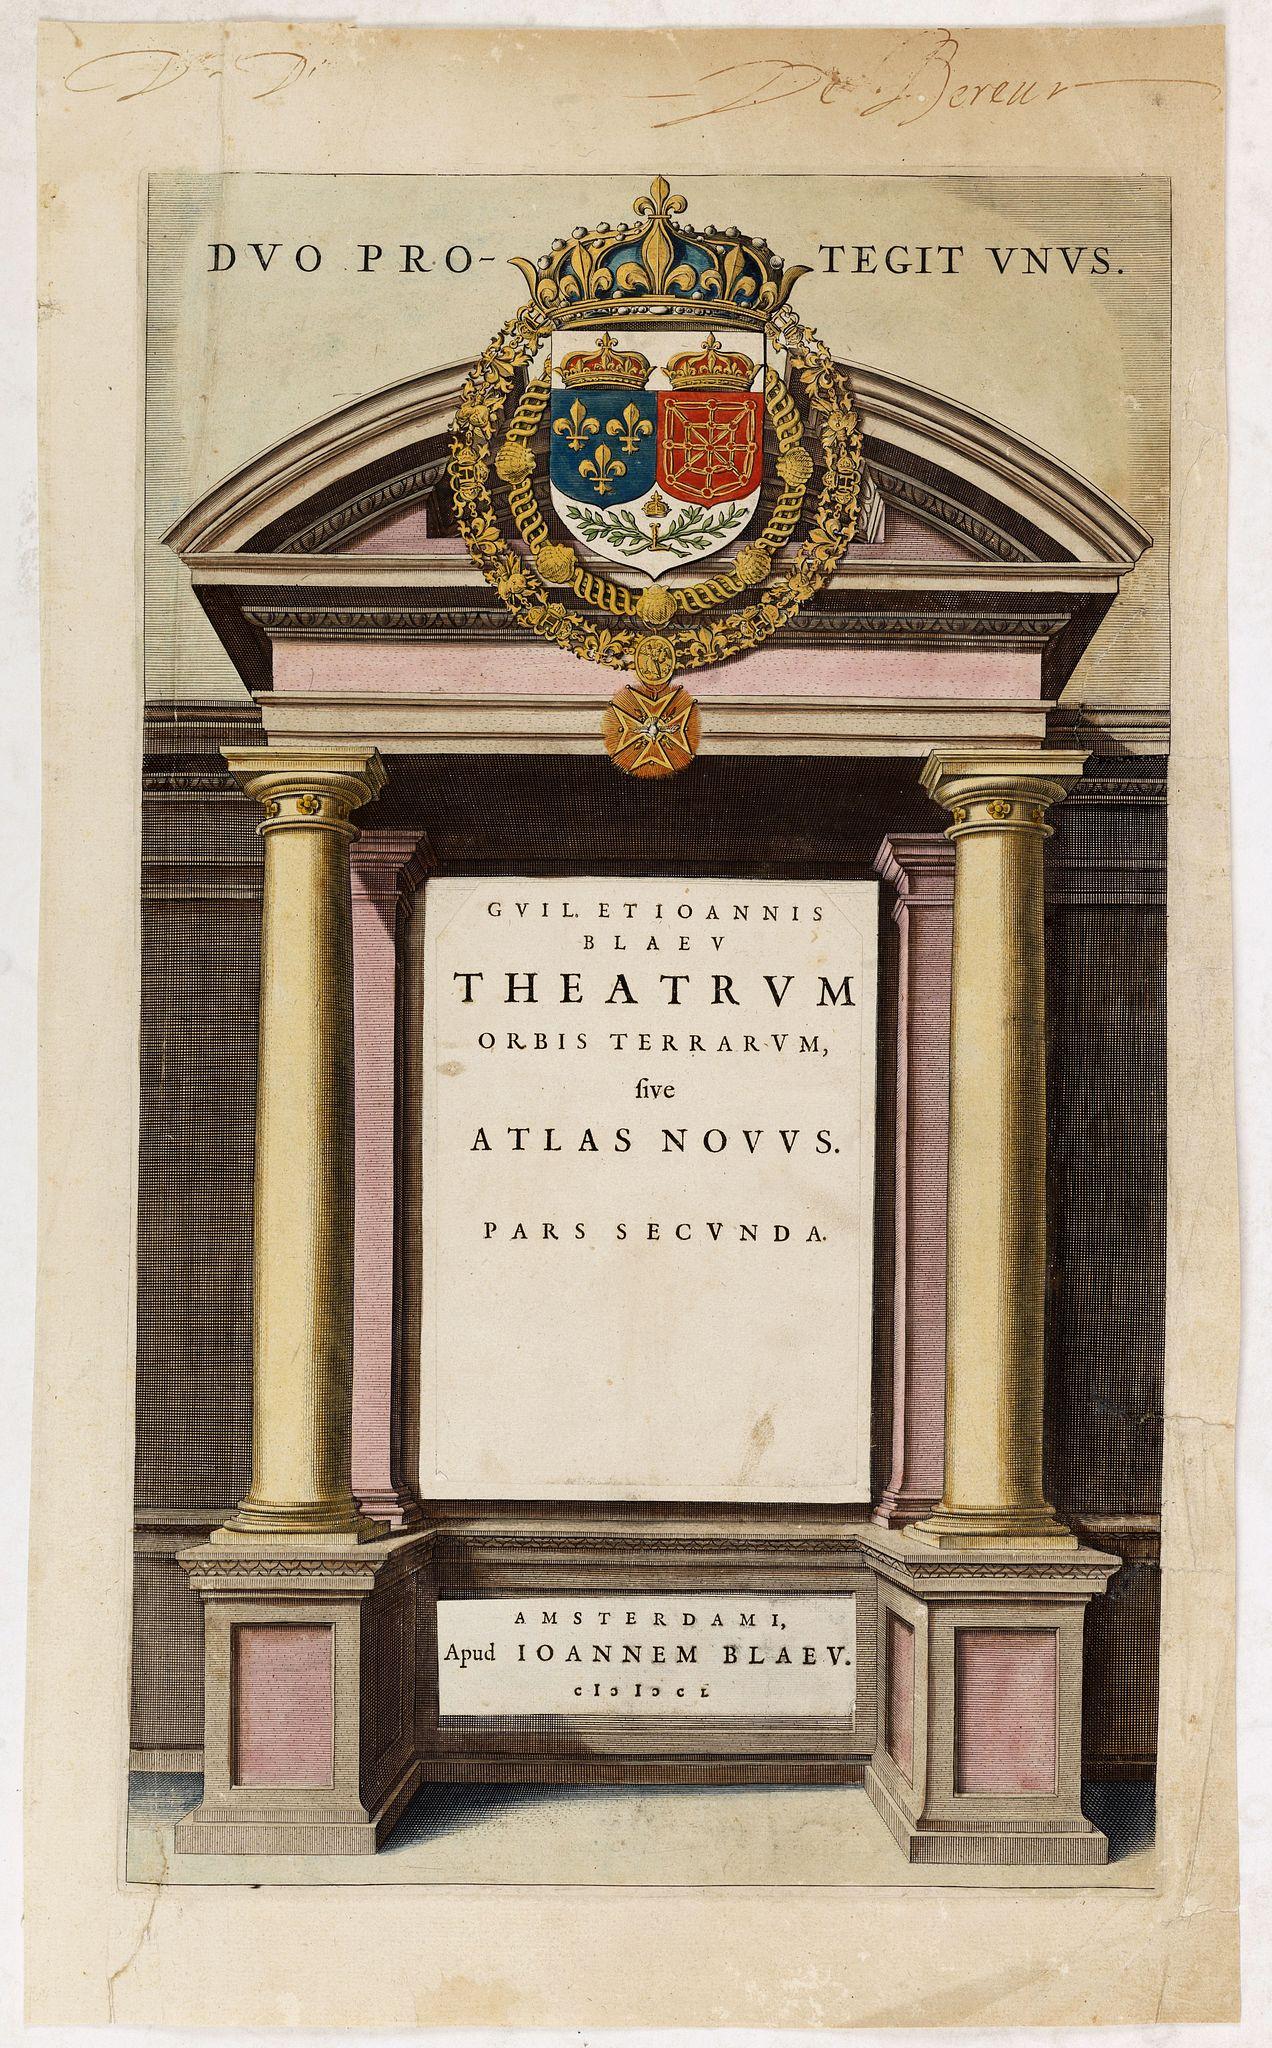 BLAEU, J. -  (Title page from ) . . . Atlas Novus pars secunda. Duo Protegit Unus.